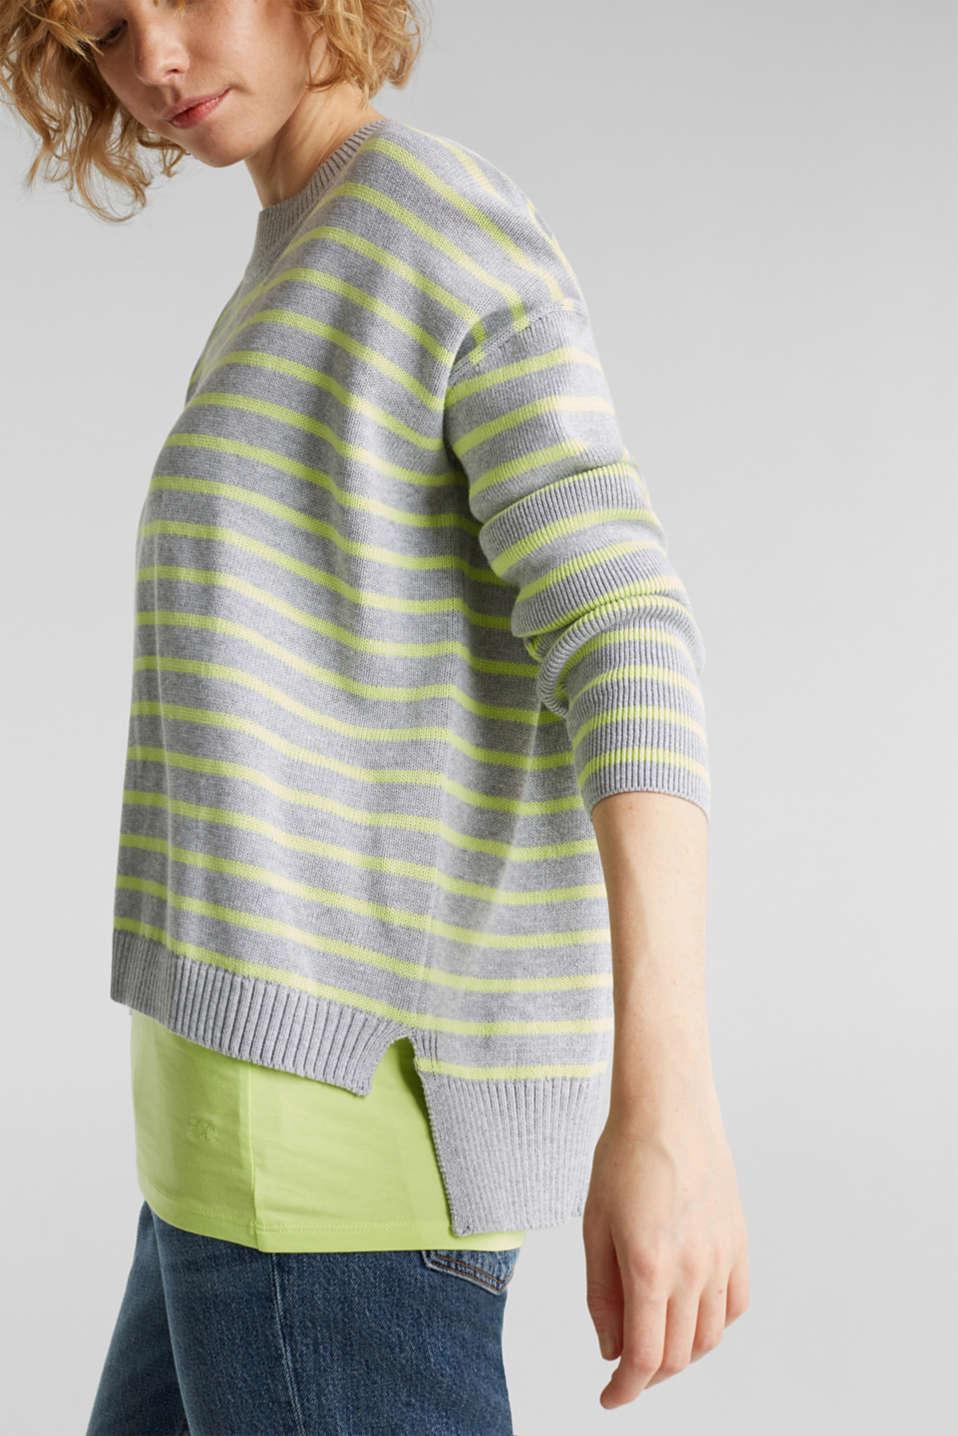 Oversized jumper with stripes, 100% cotton, LIGHT GREY 4, detail image number 2